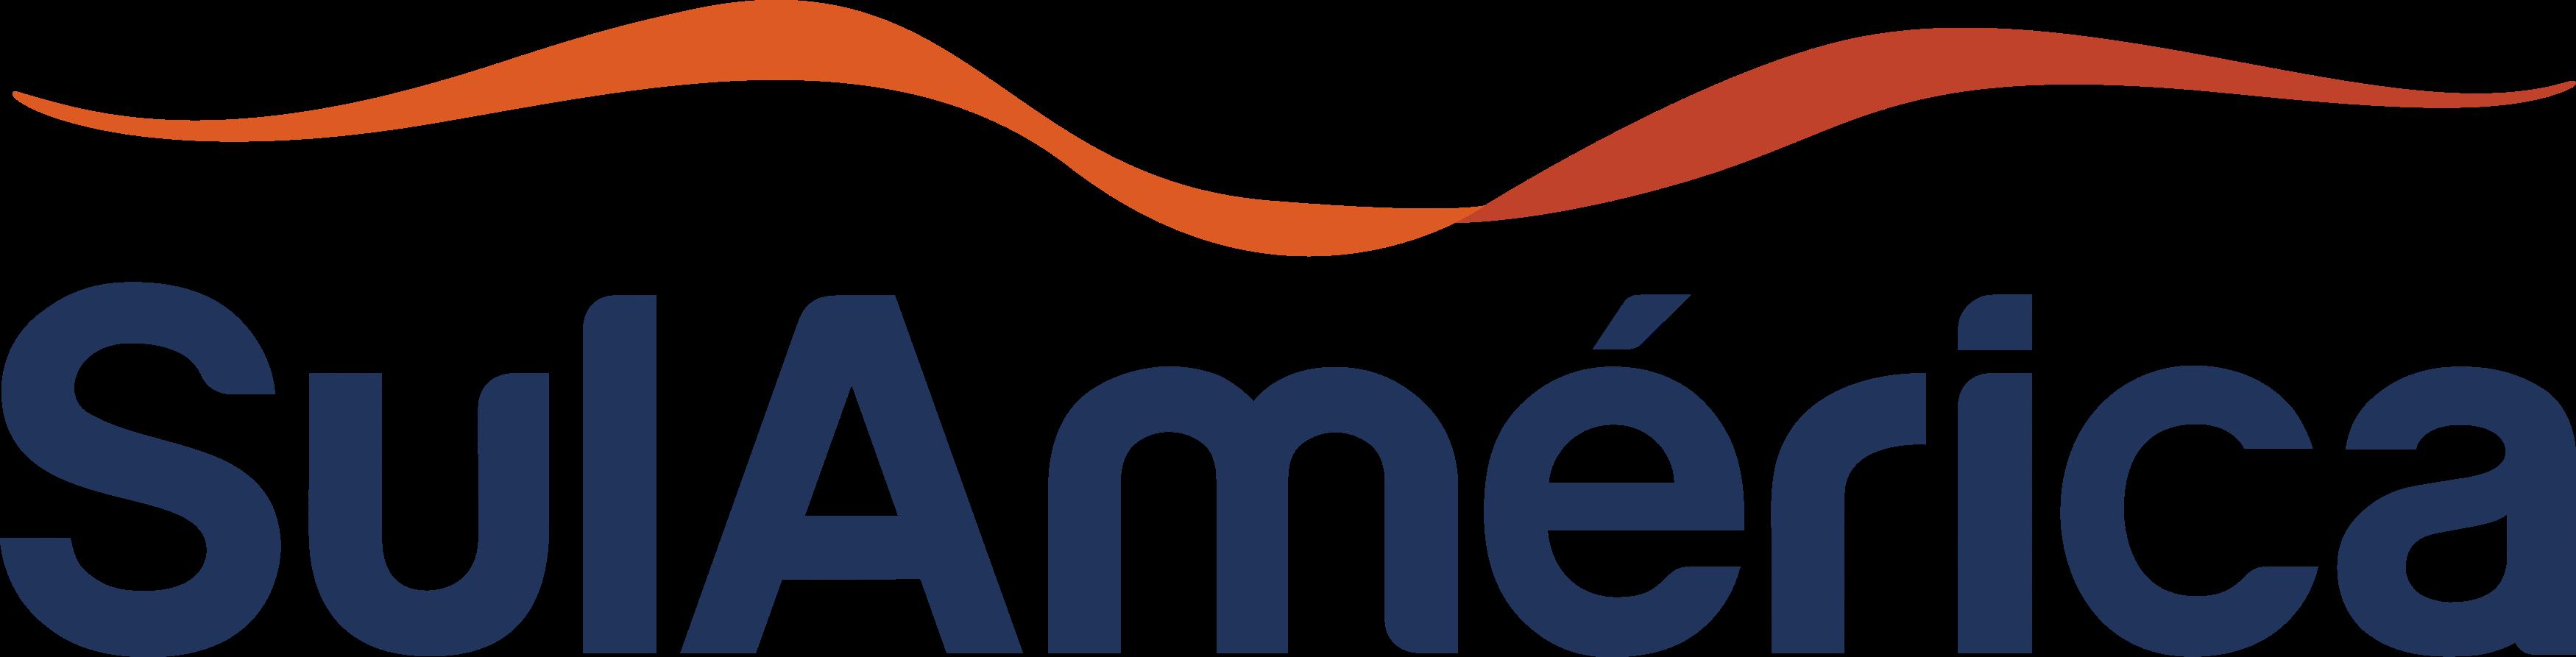 SulAmérica logo.